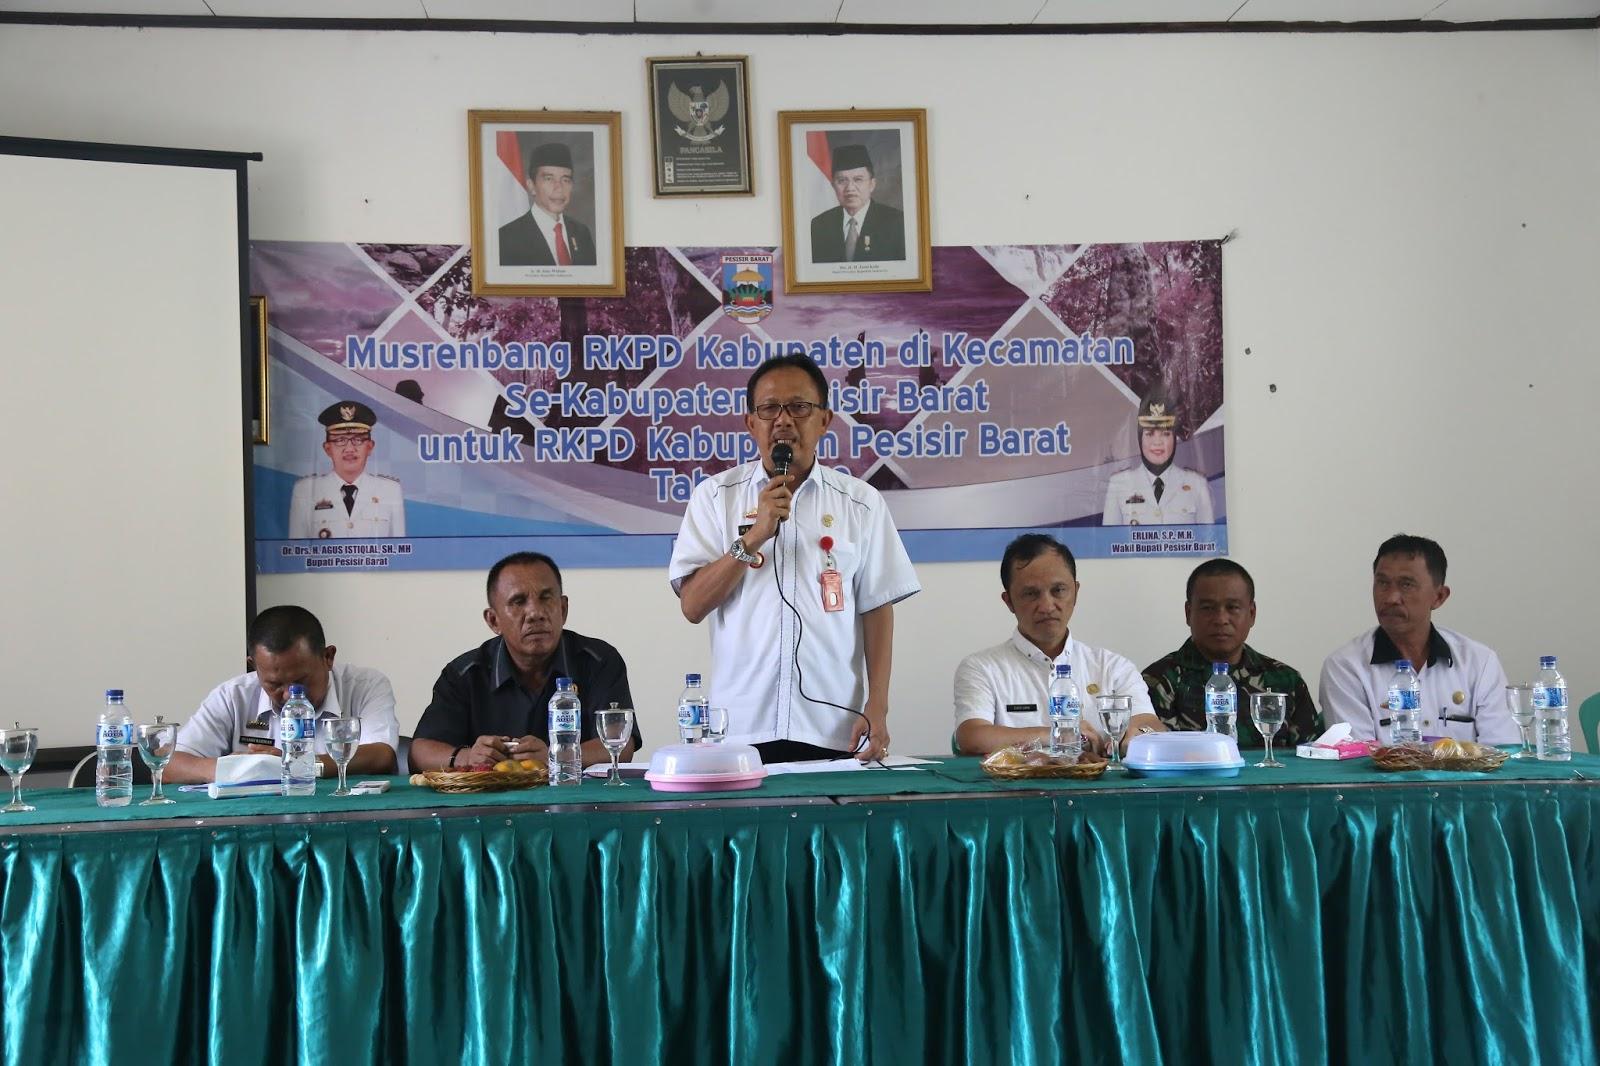 Musrenbang Tingkat Kecamat Kabupaten Pesisir Barat Editor Lambar Kopi Robusta By Yoen Iskan Akumandiri